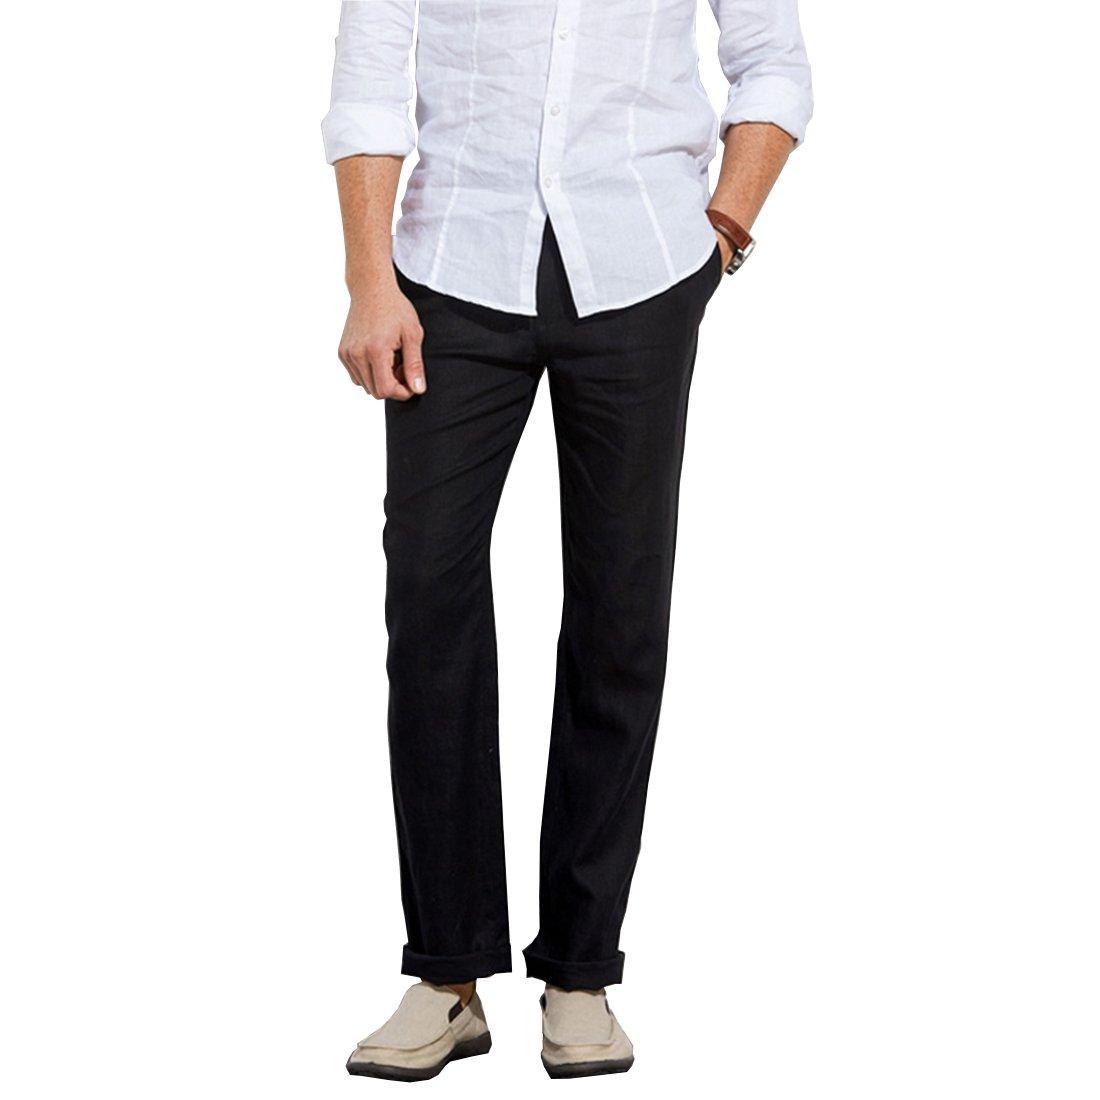 Manwan walk Men's Casual Beach Trousers Elastic Loose Fit Lightweight Linen Summer Pants K70 (Small, Black)